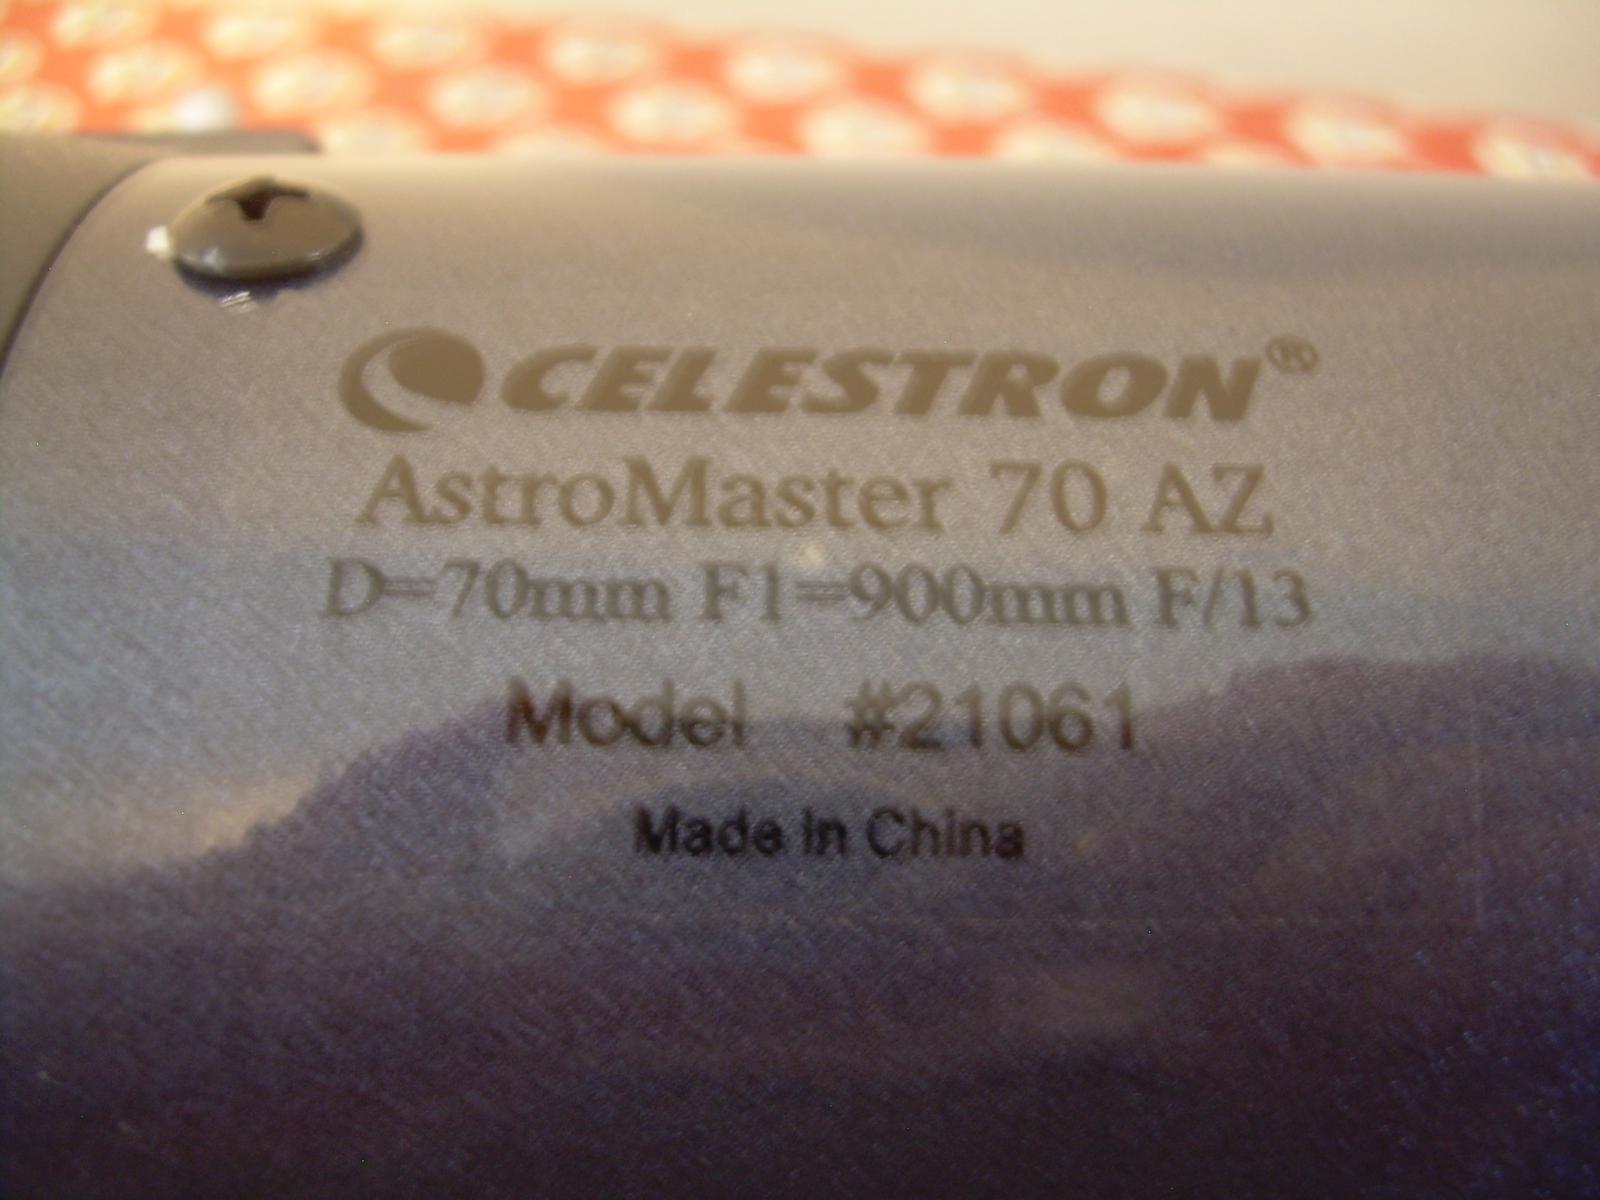 For sale celestron astromaster az refractor telescope